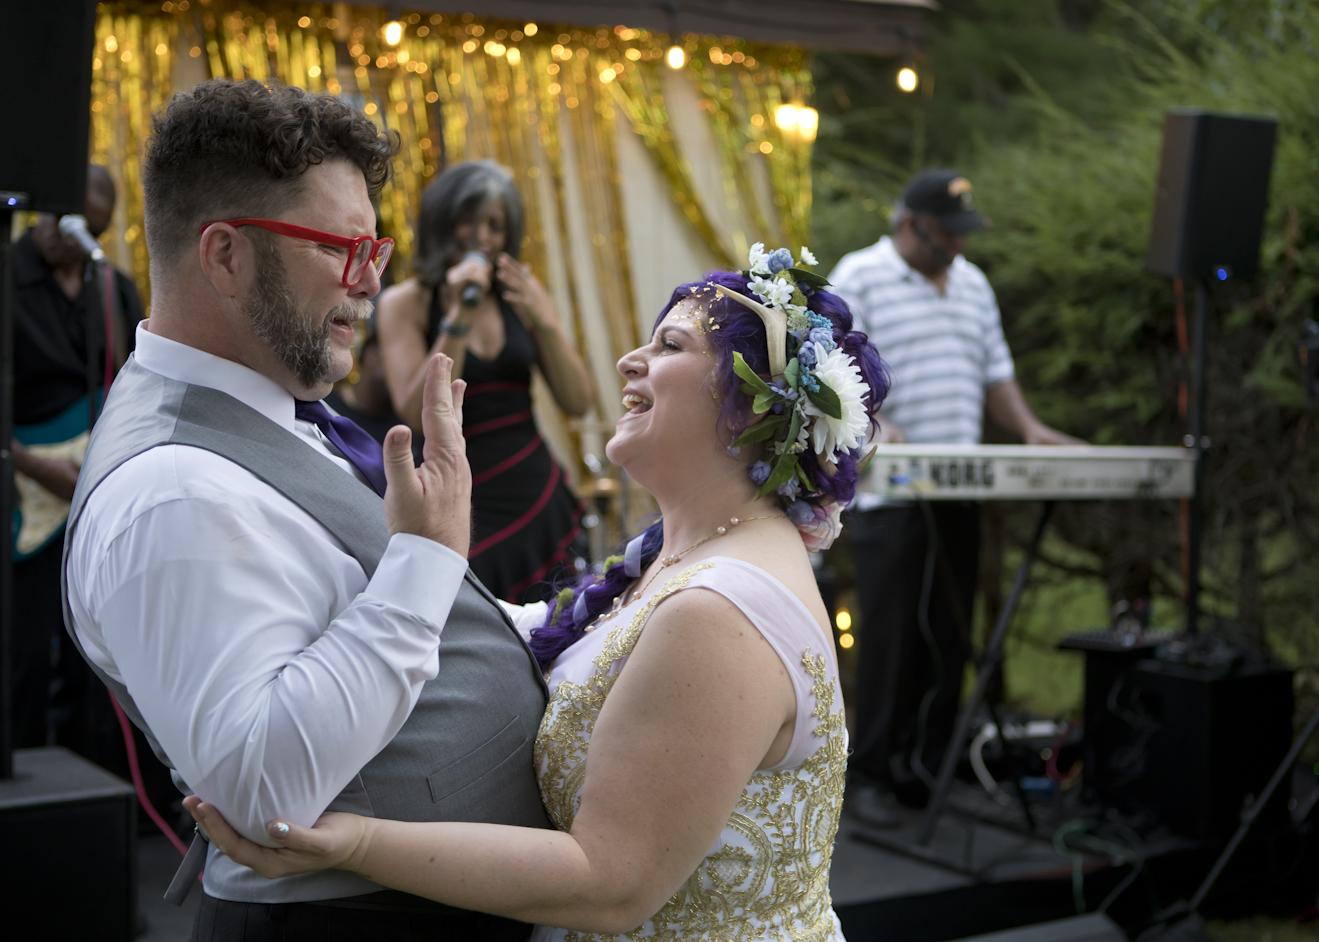 Tina and Adam wedding_Studio Misha Wedding Photography Asheville Photographer and Videographer00111.JPG